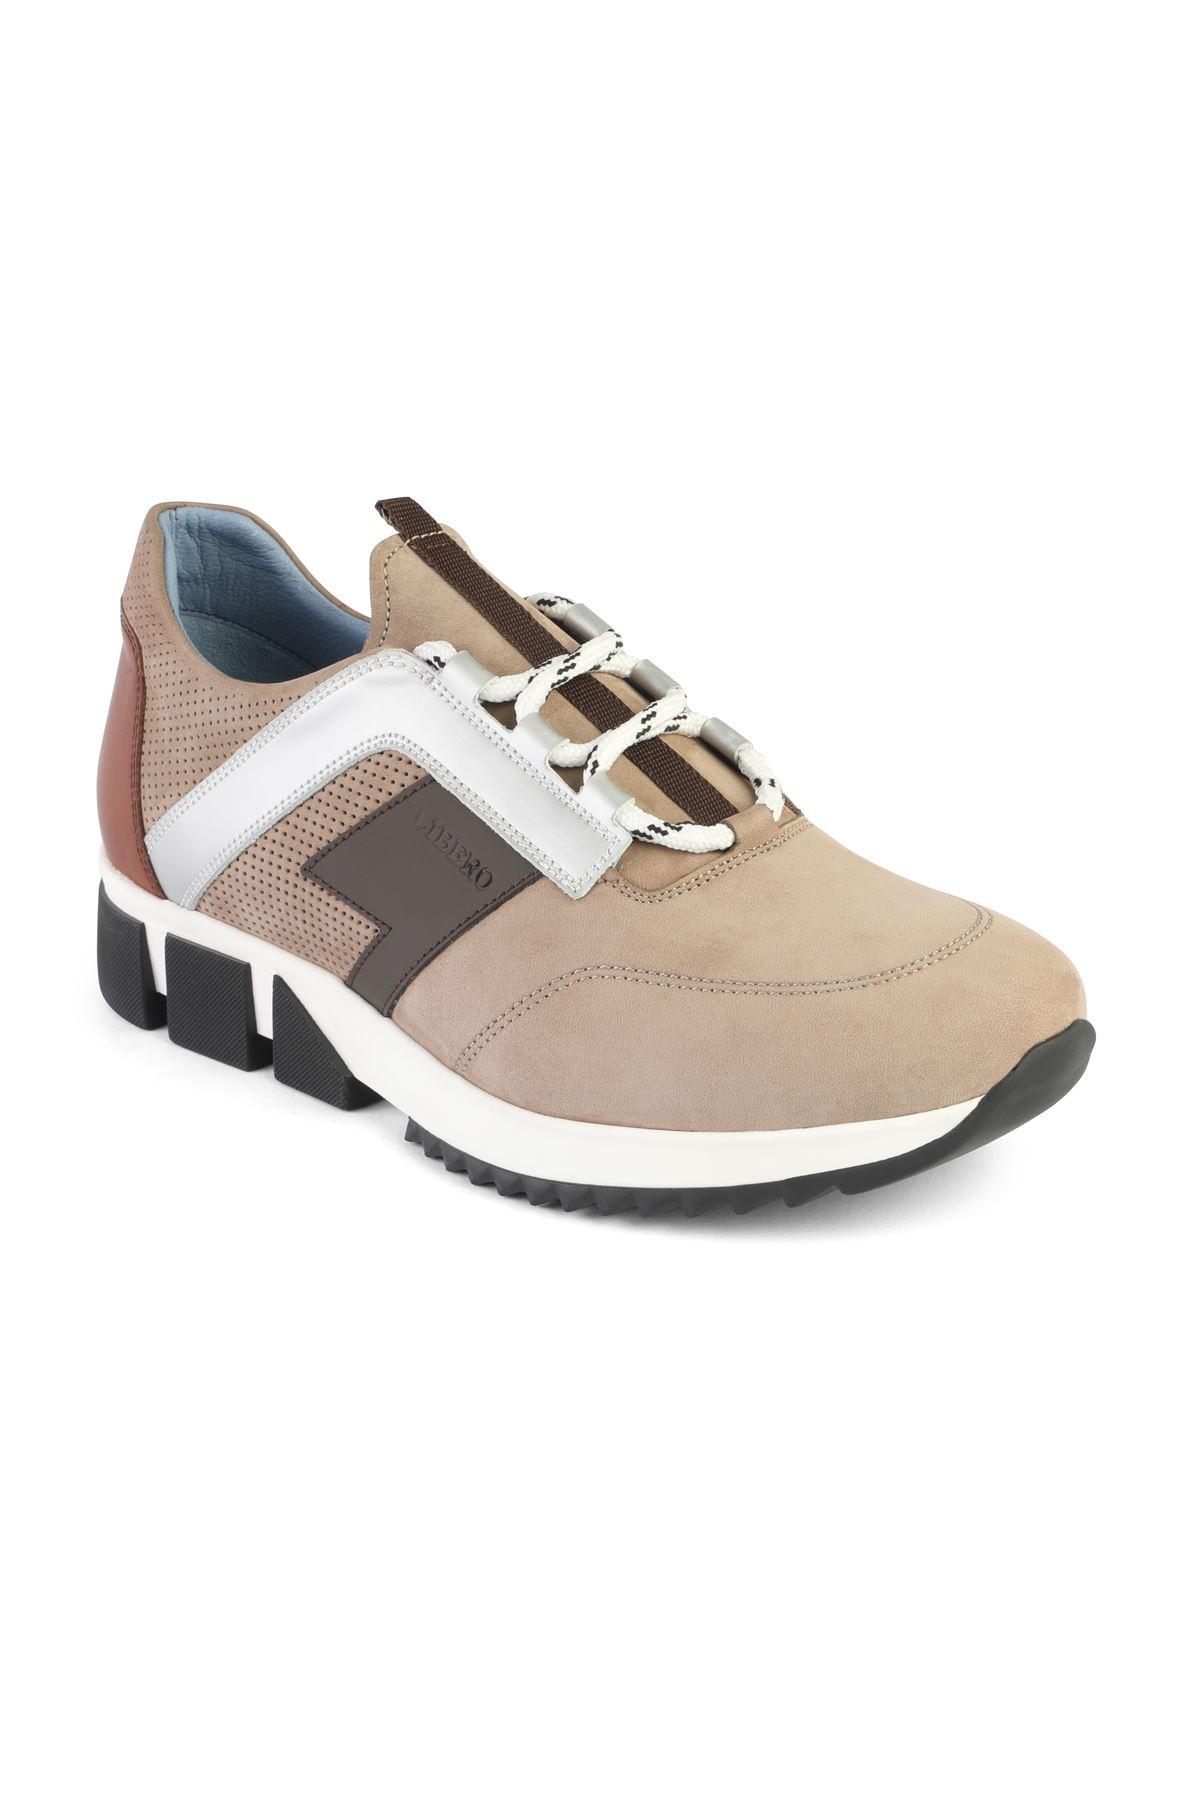 Libero 3391 Mink Sport Shoes